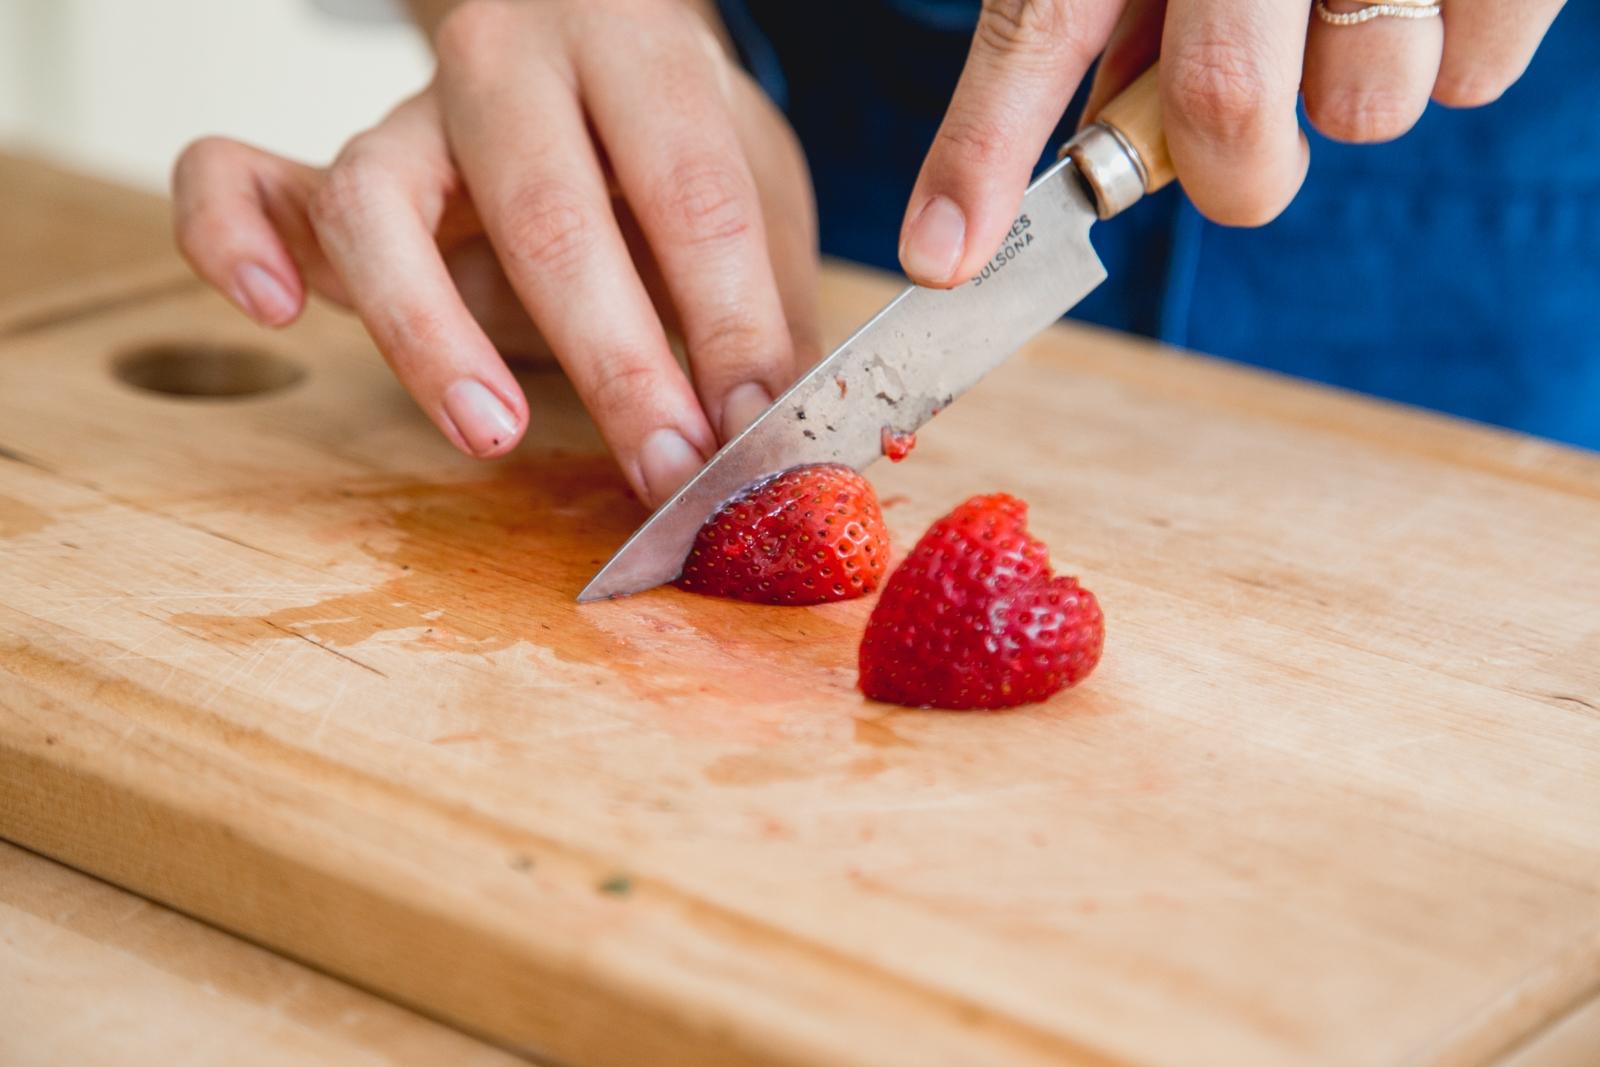 process strawberries2.jpg